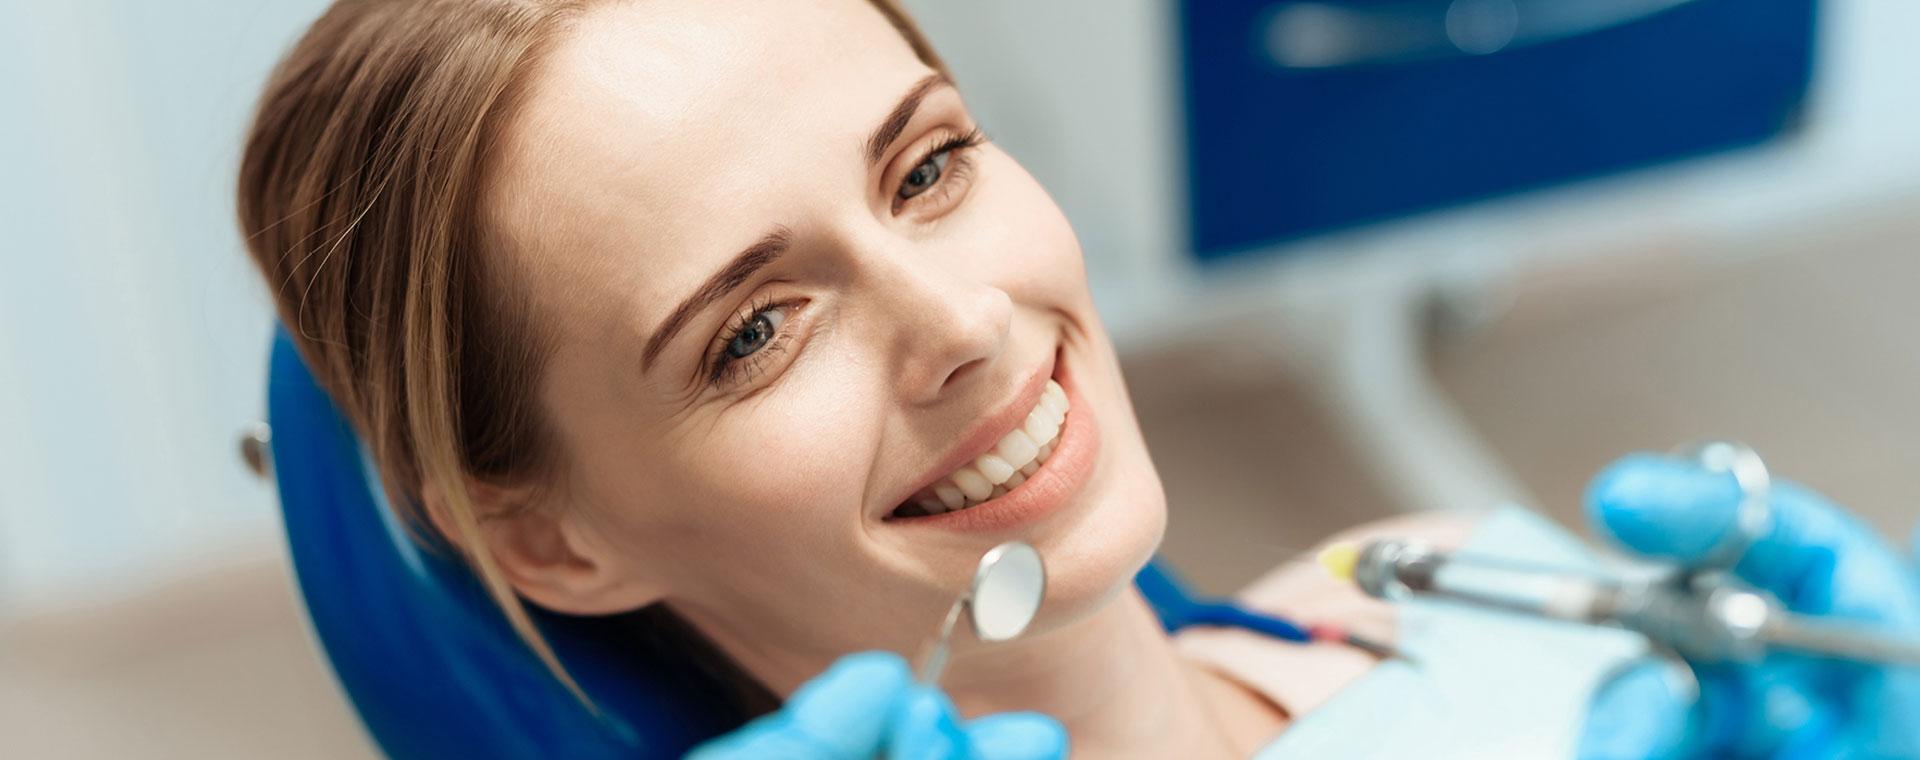 Ortodonzia per adulti? Yes We Can